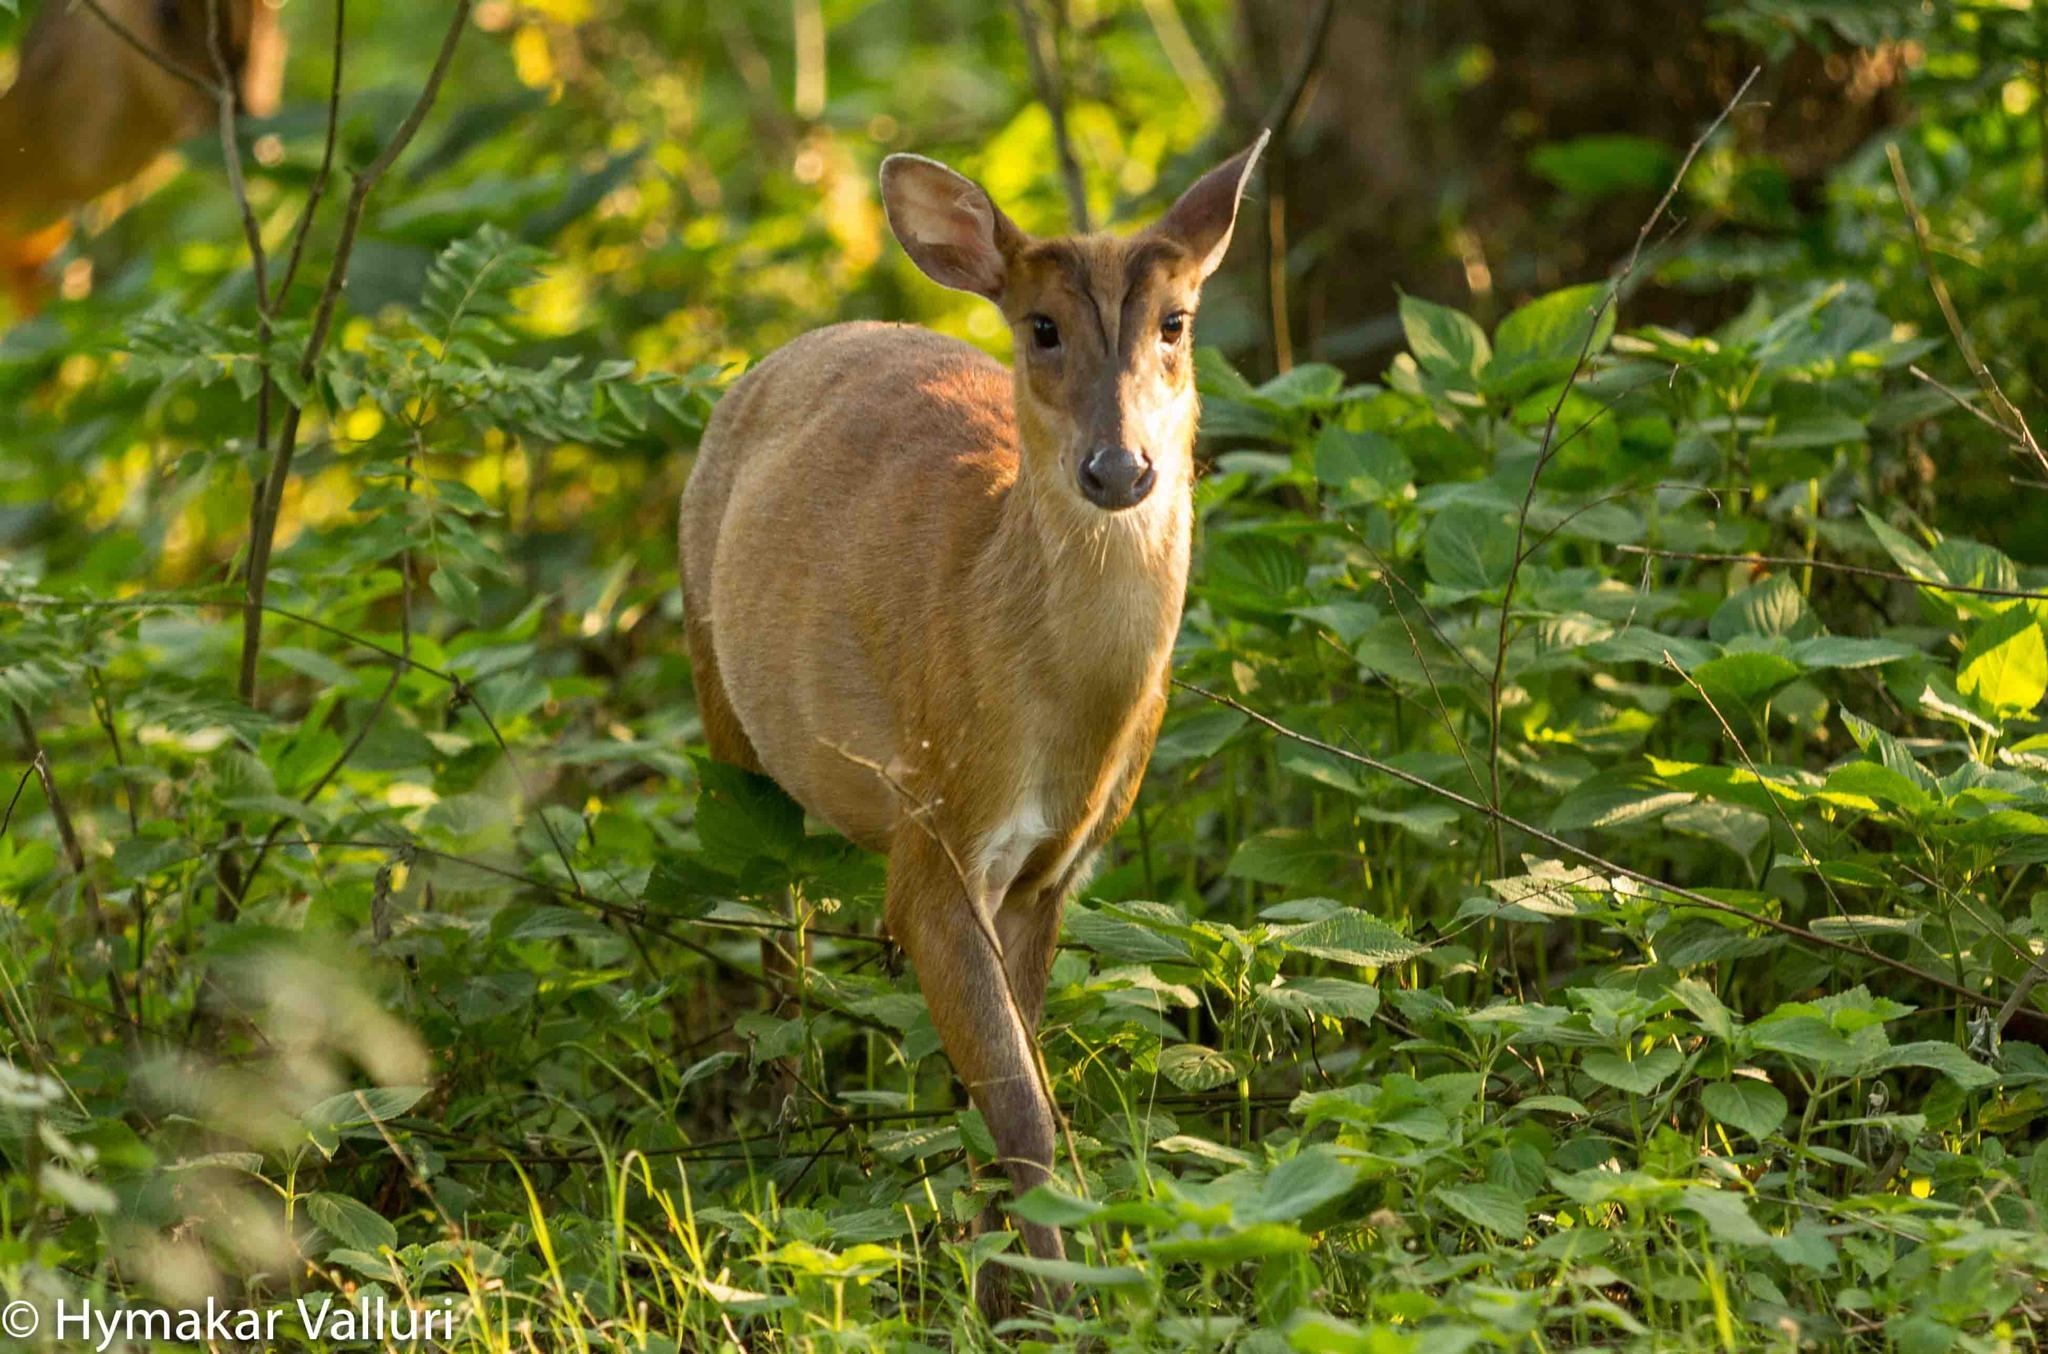 Barking Deer by Hymakar